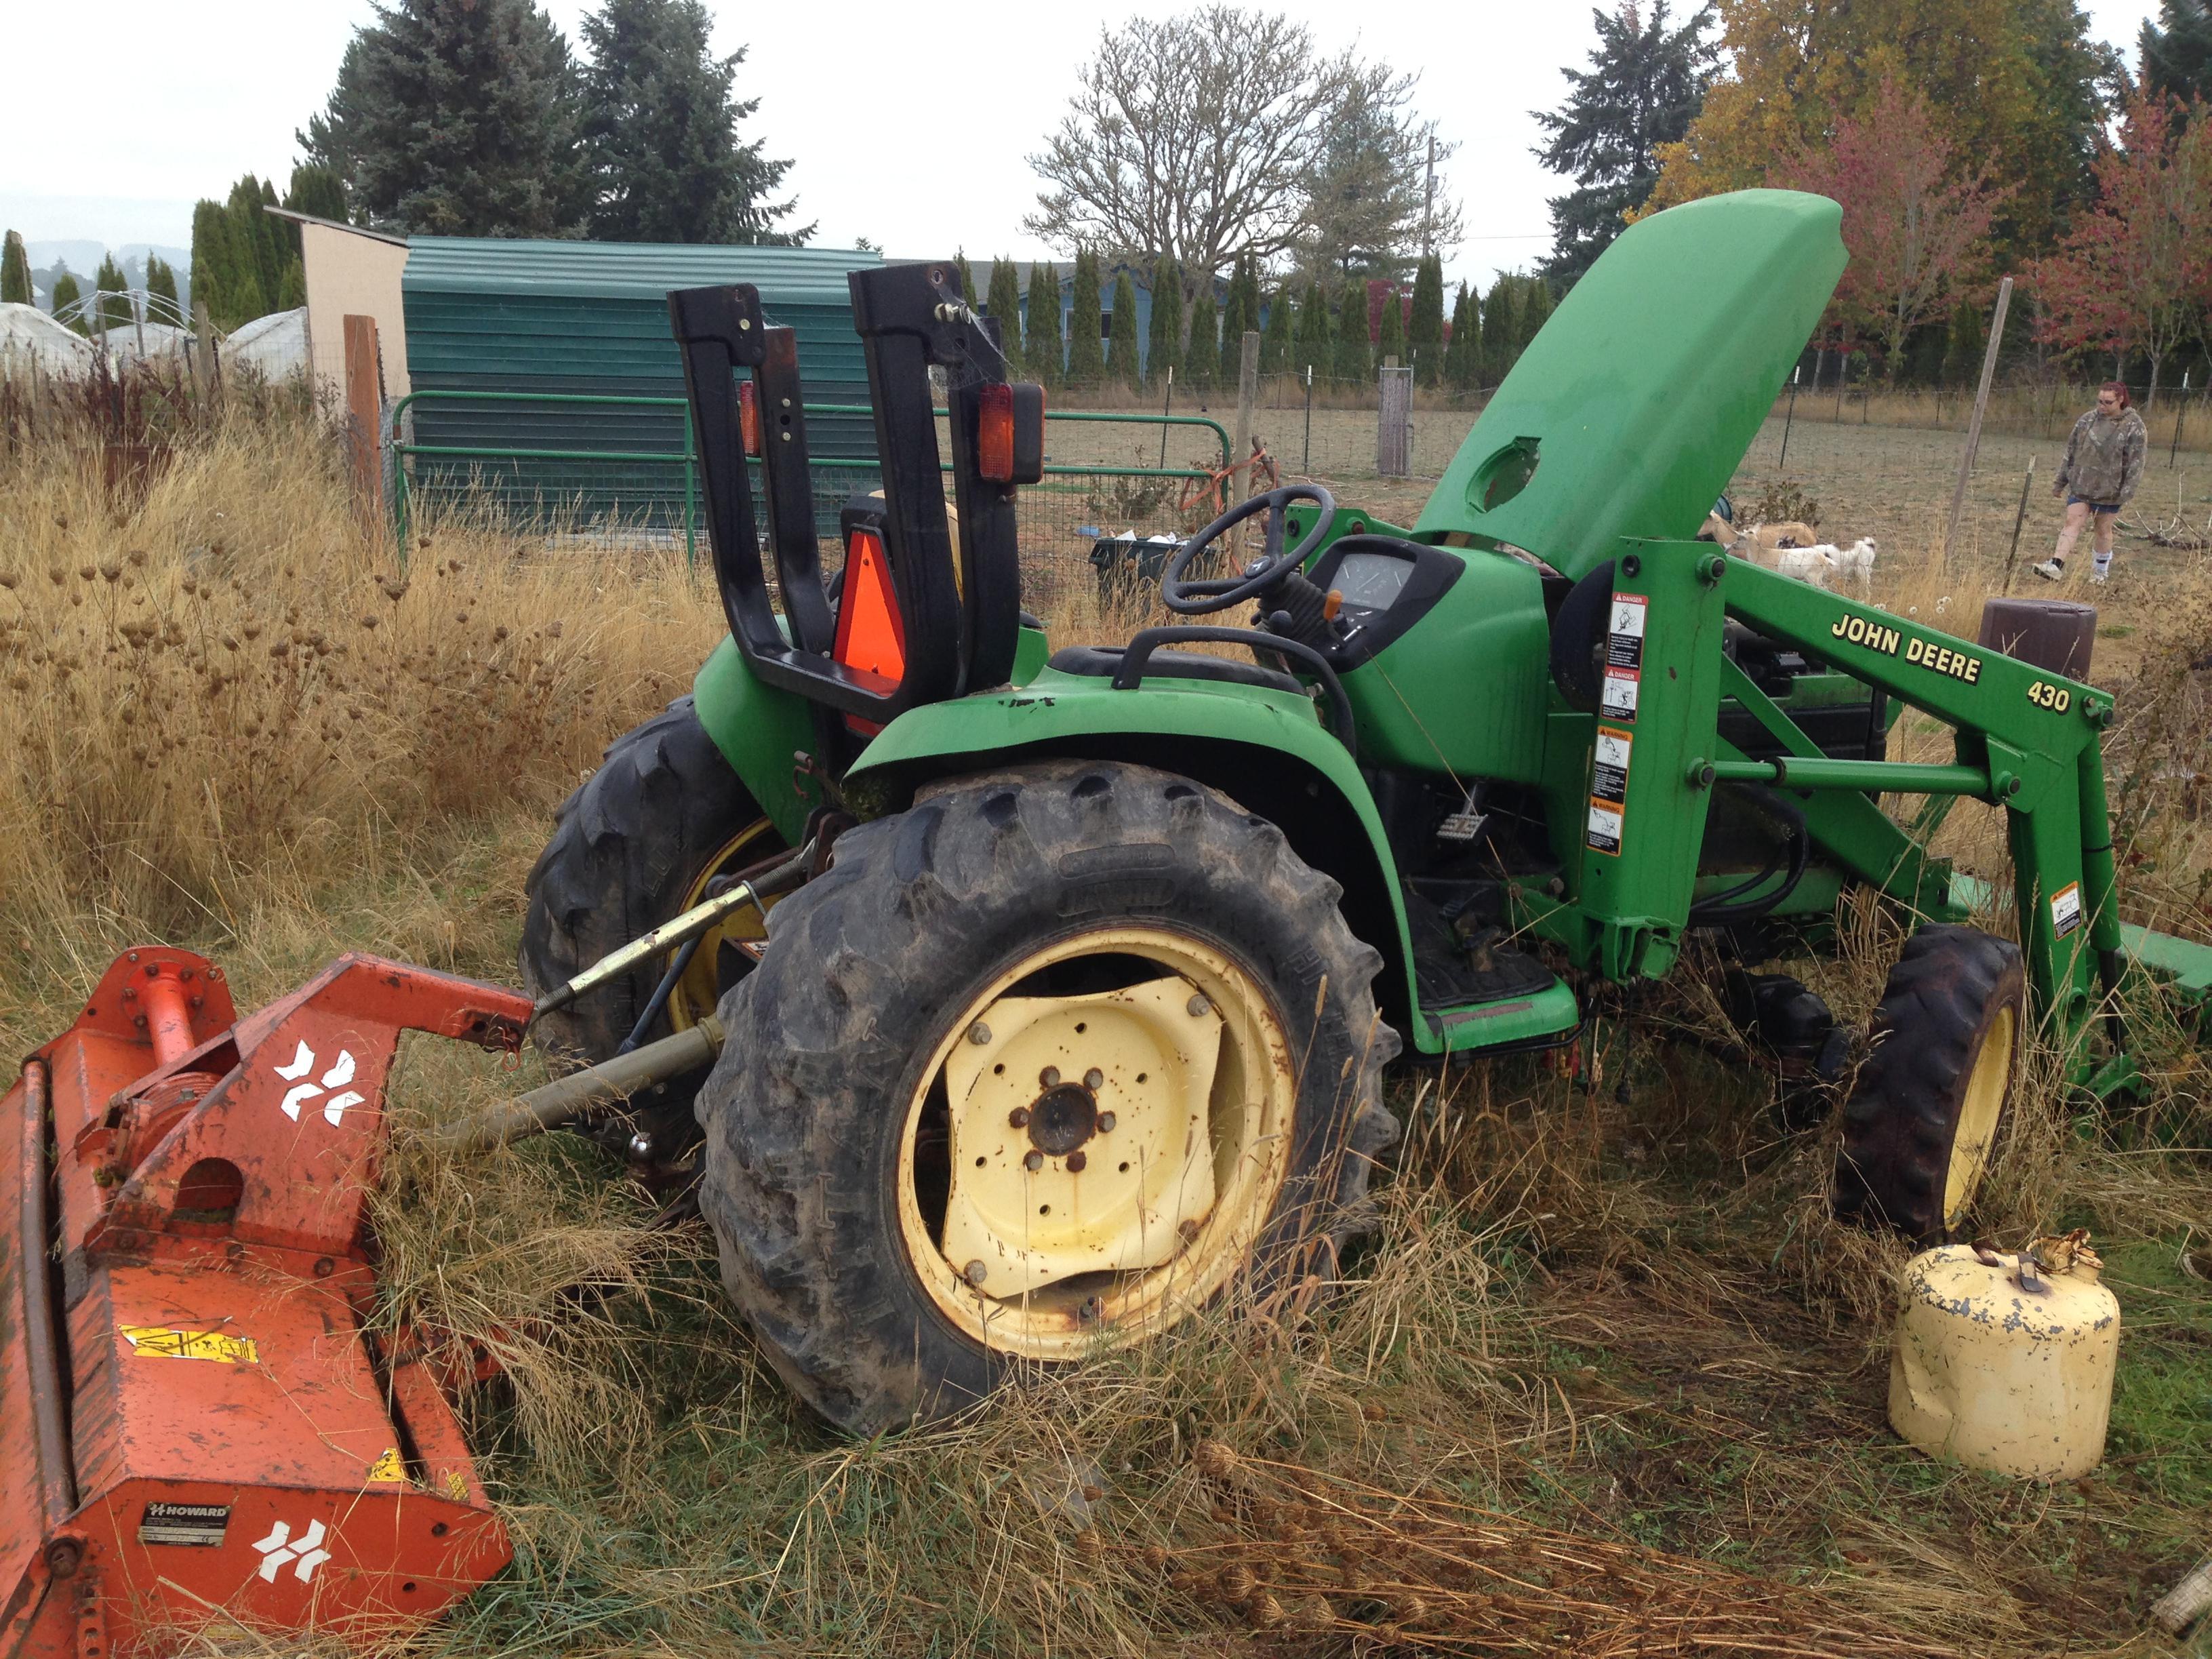 John Deere 4400 project tractor – John Deere 2320 Fuse Box